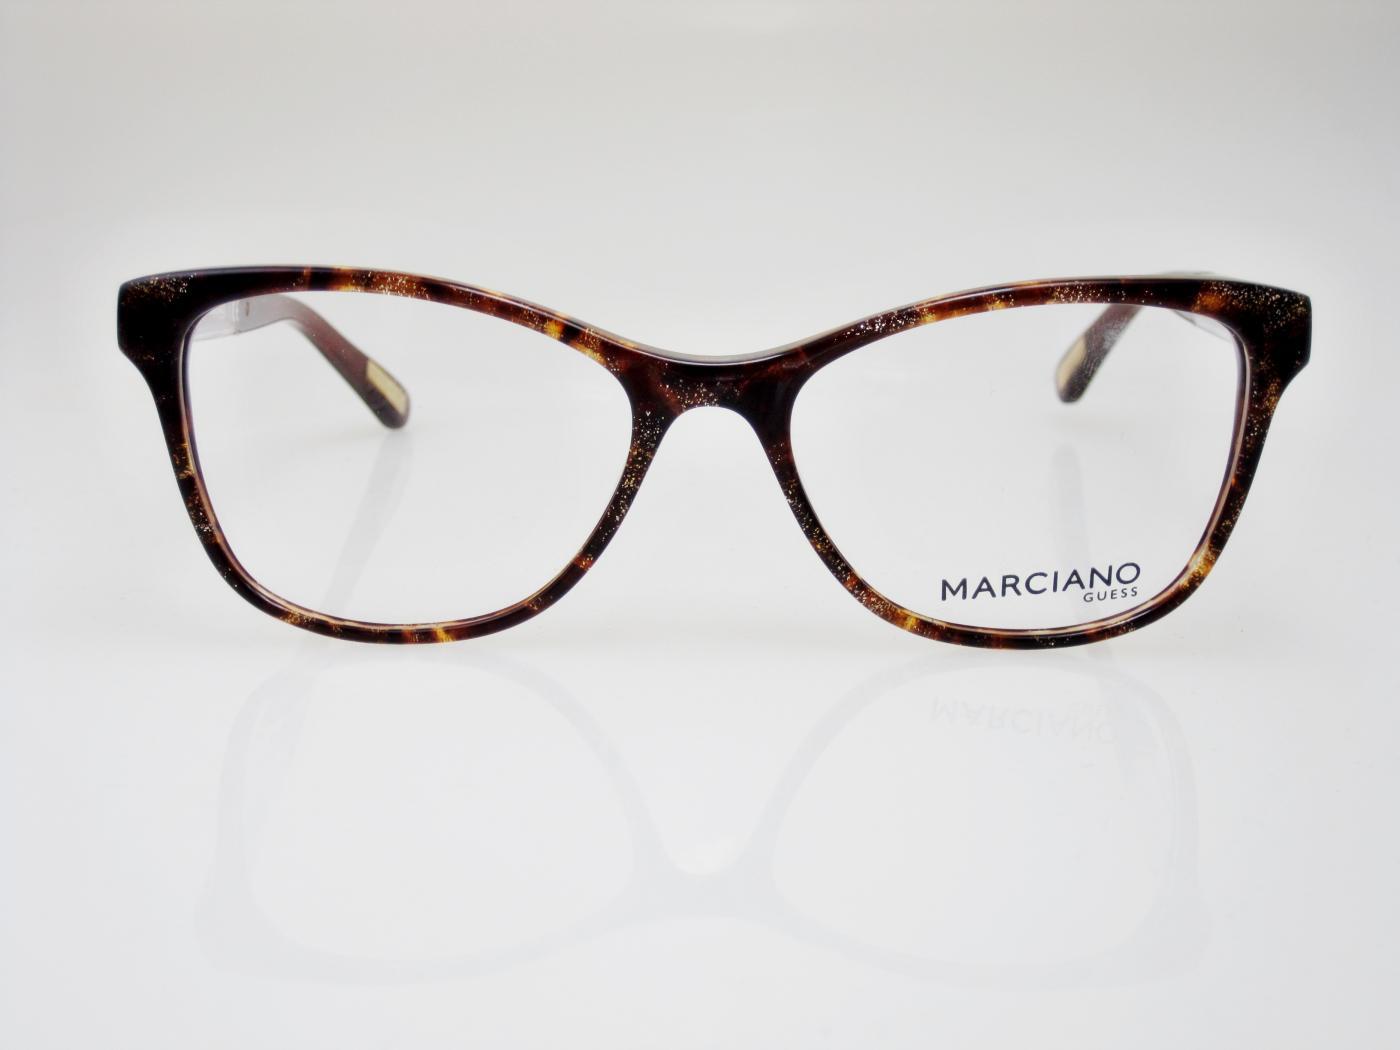 Dámske dioptrické okuliare Guess by Marciano 01f9b11bb8c